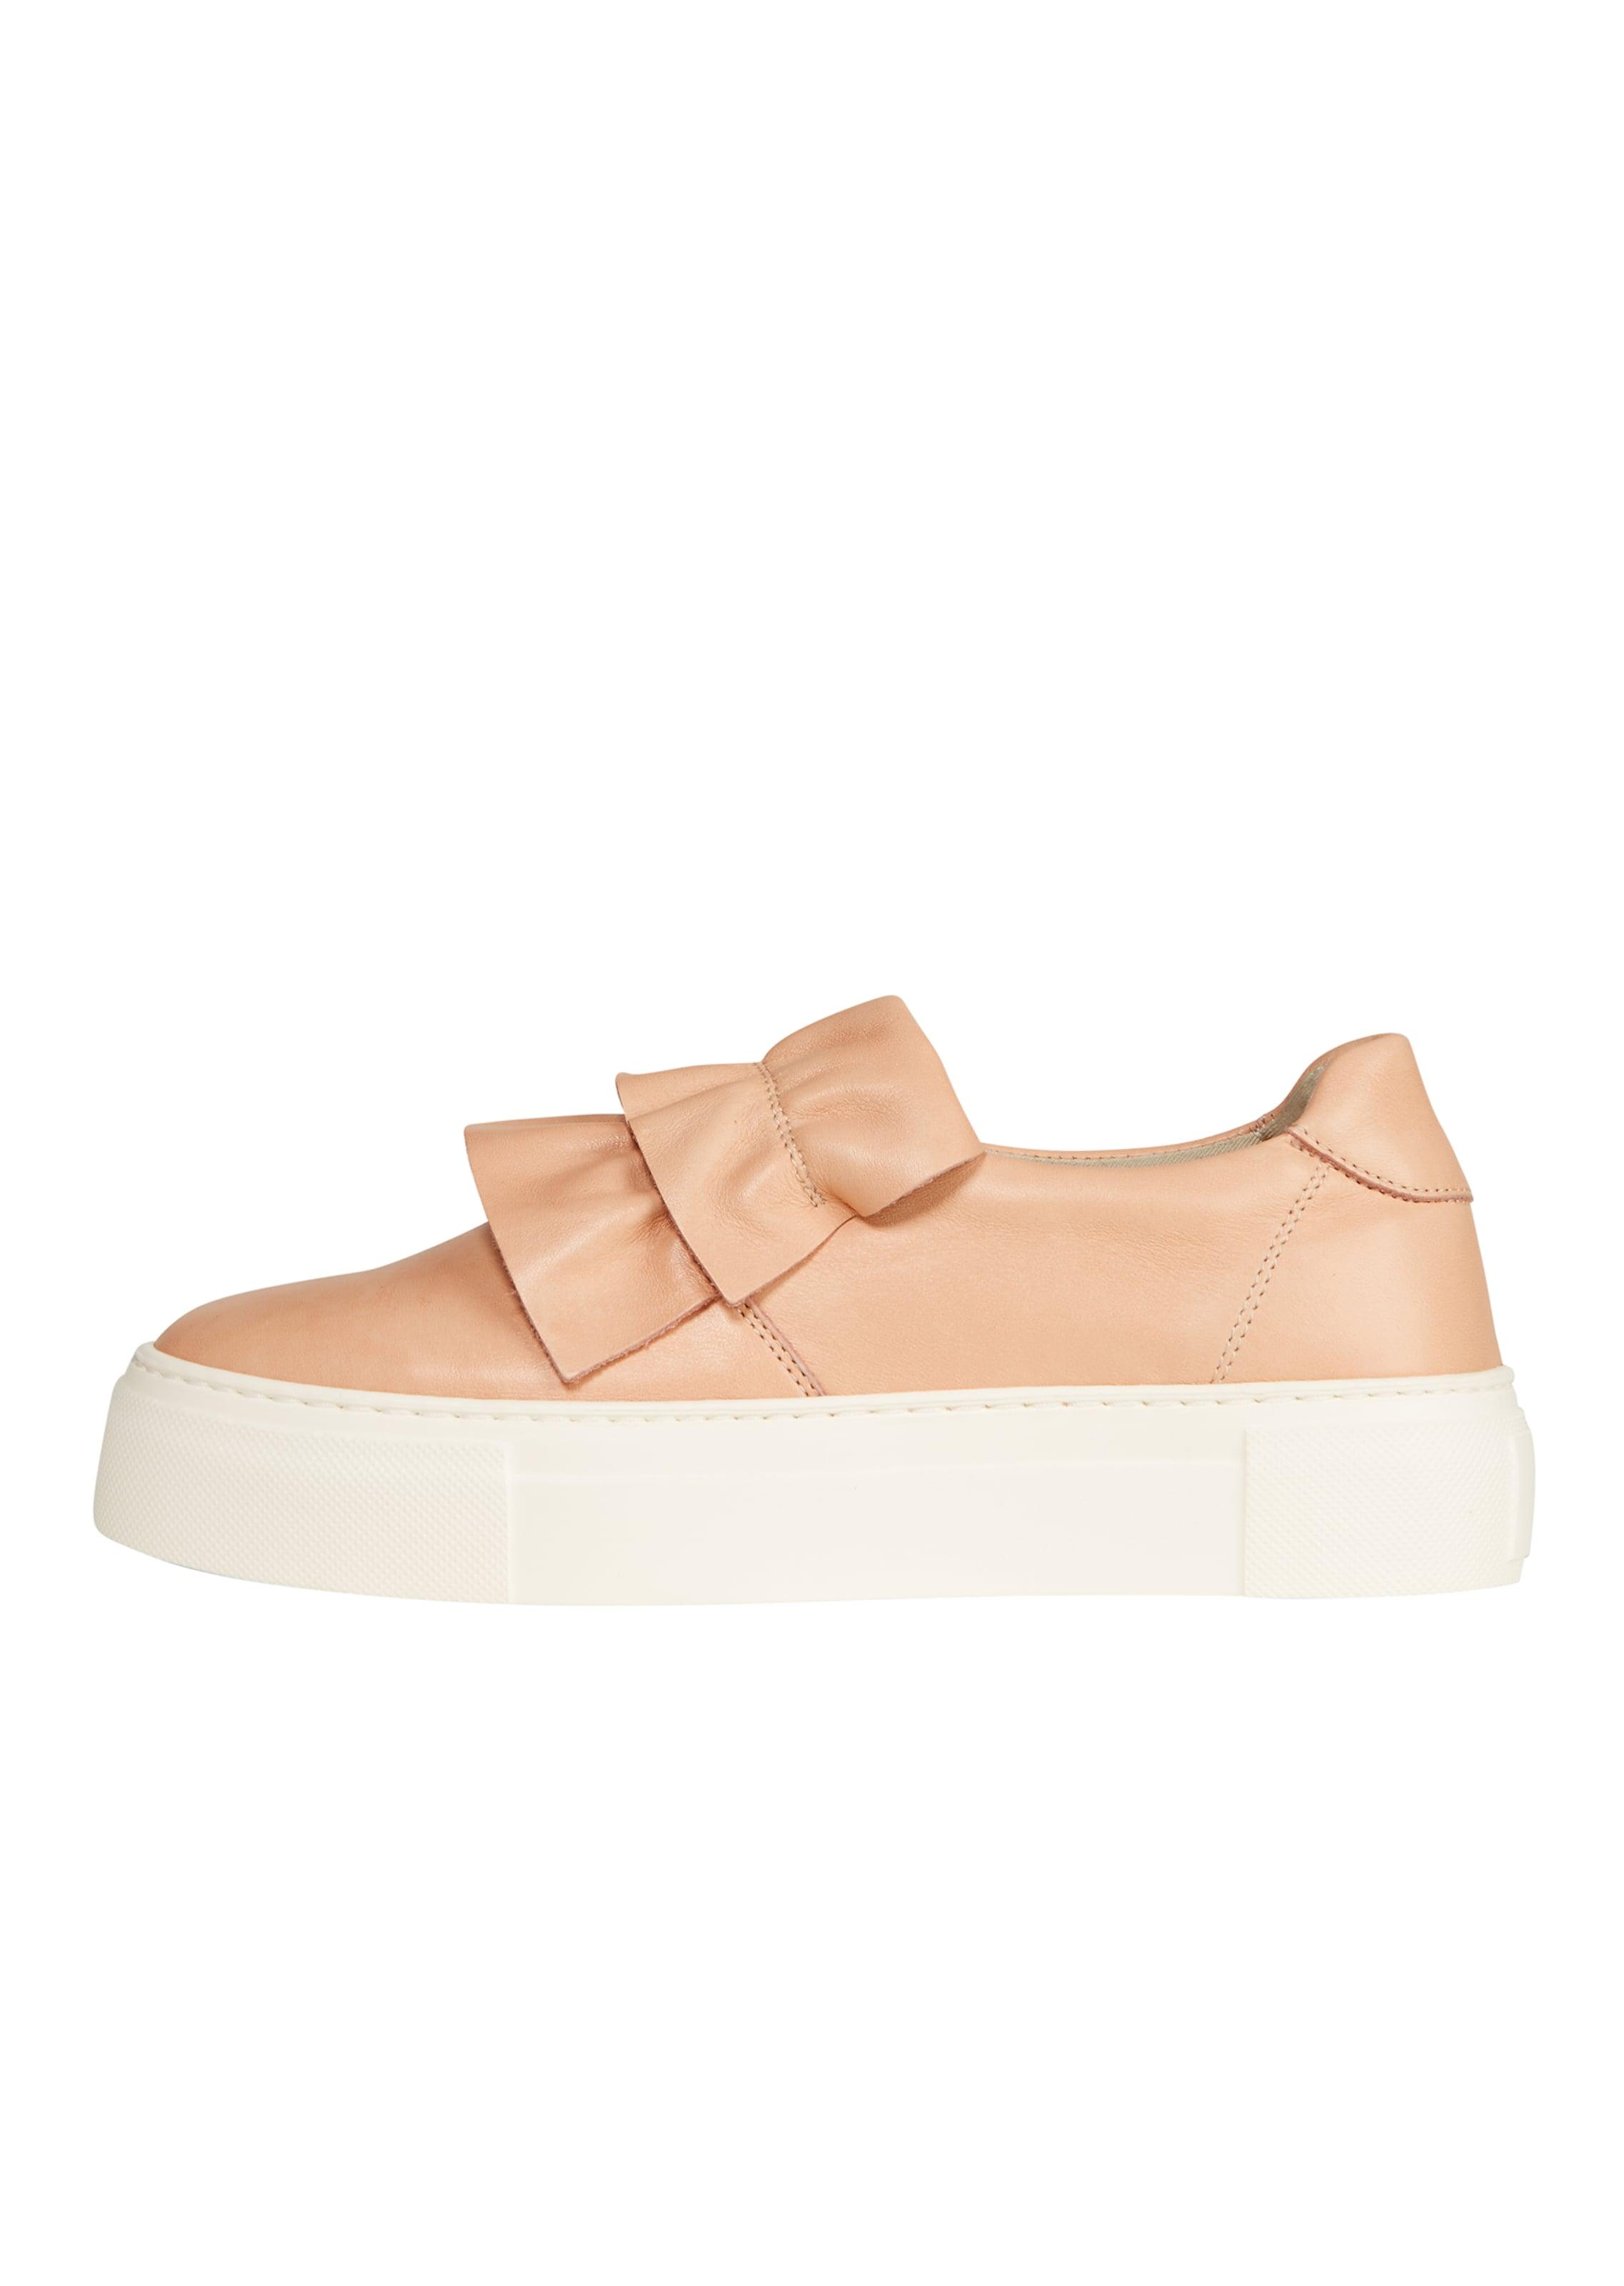 Marc O Polo | Slip On-Sneaker